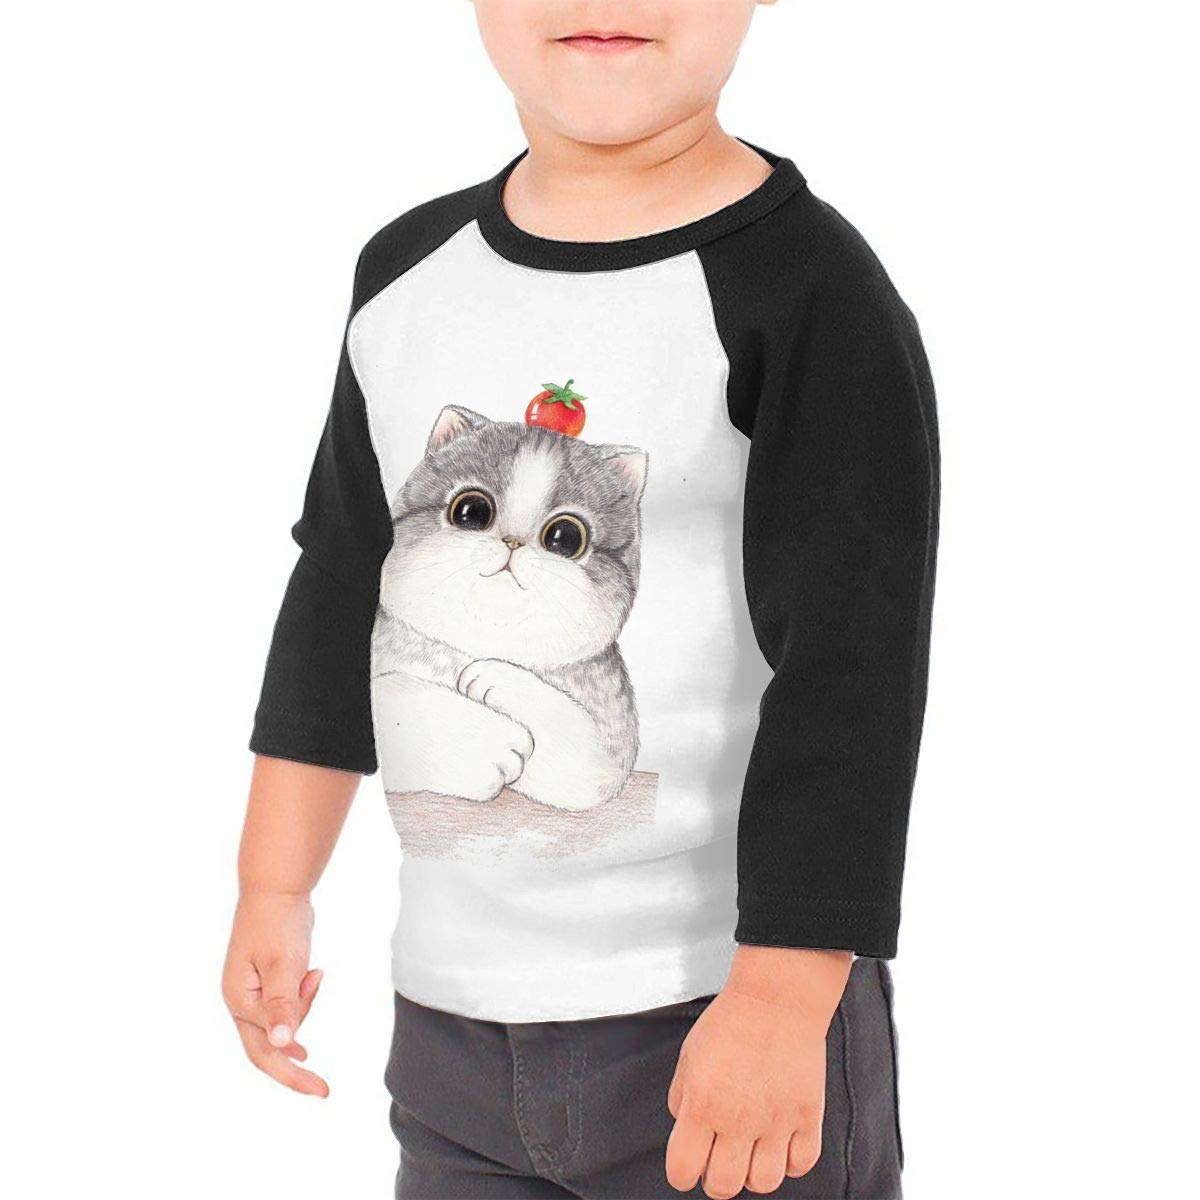 RhteGui AJR Boys /& Girls Junior Vintage Long Sleeve T-Shirt Black